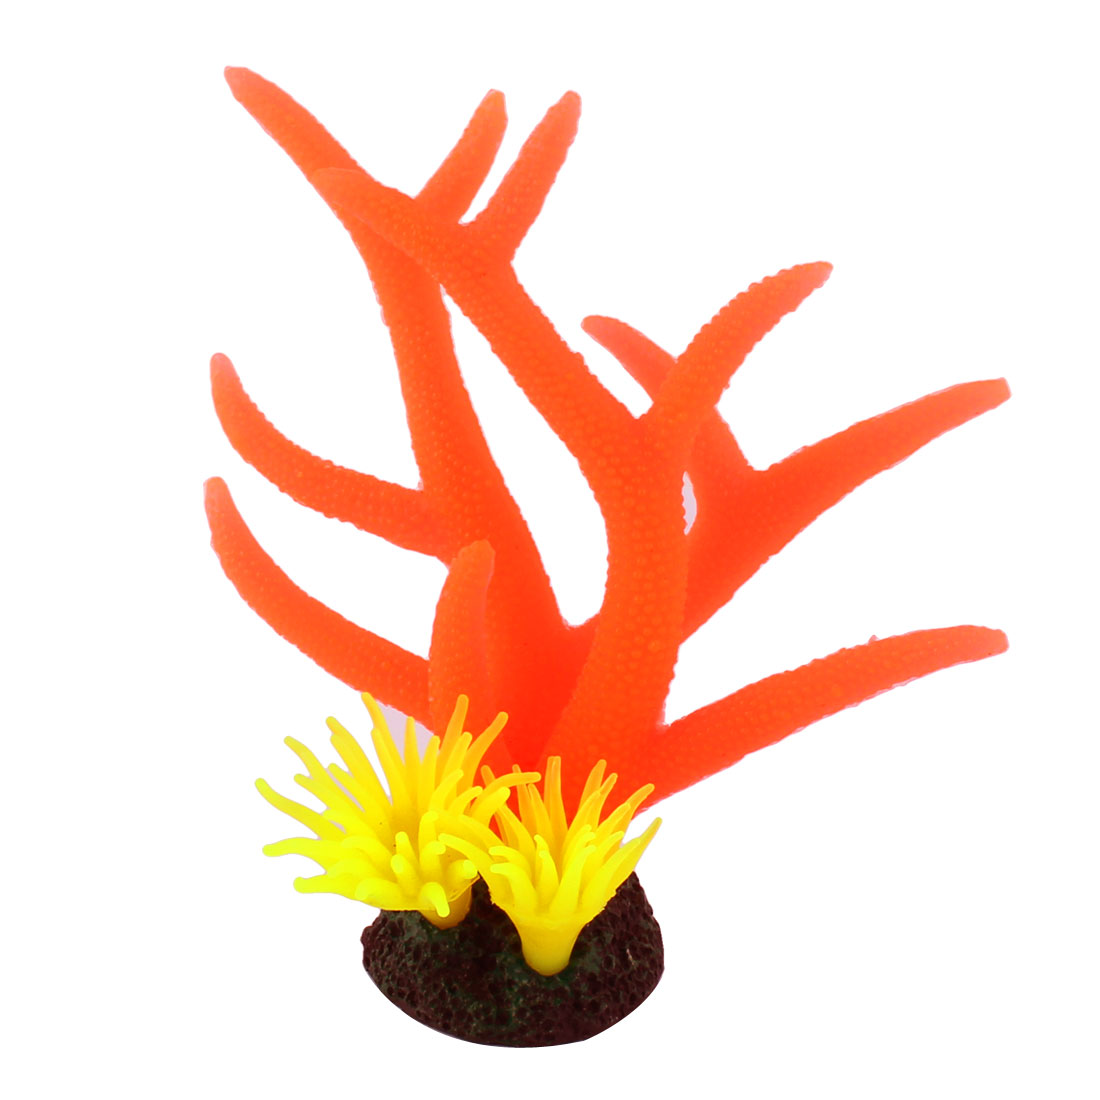 Aquarium Fish Tank Manmade Landscape Emulation Coral Plant Decor Orange Yellow